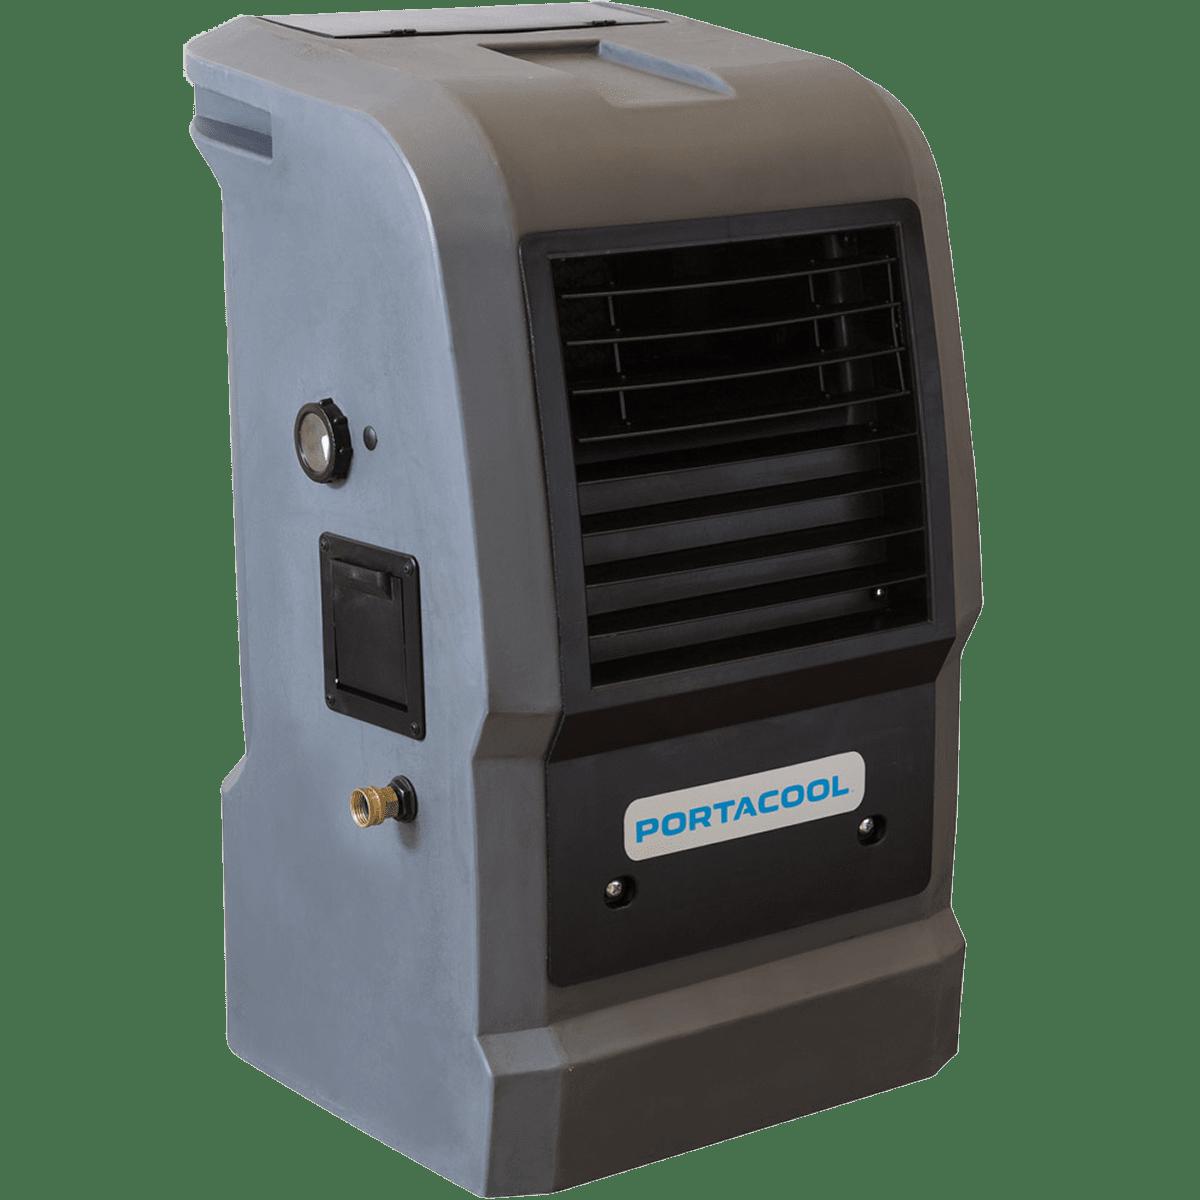 Portacool Cyclone 110 Portable Evaporative Cooler Sylvane